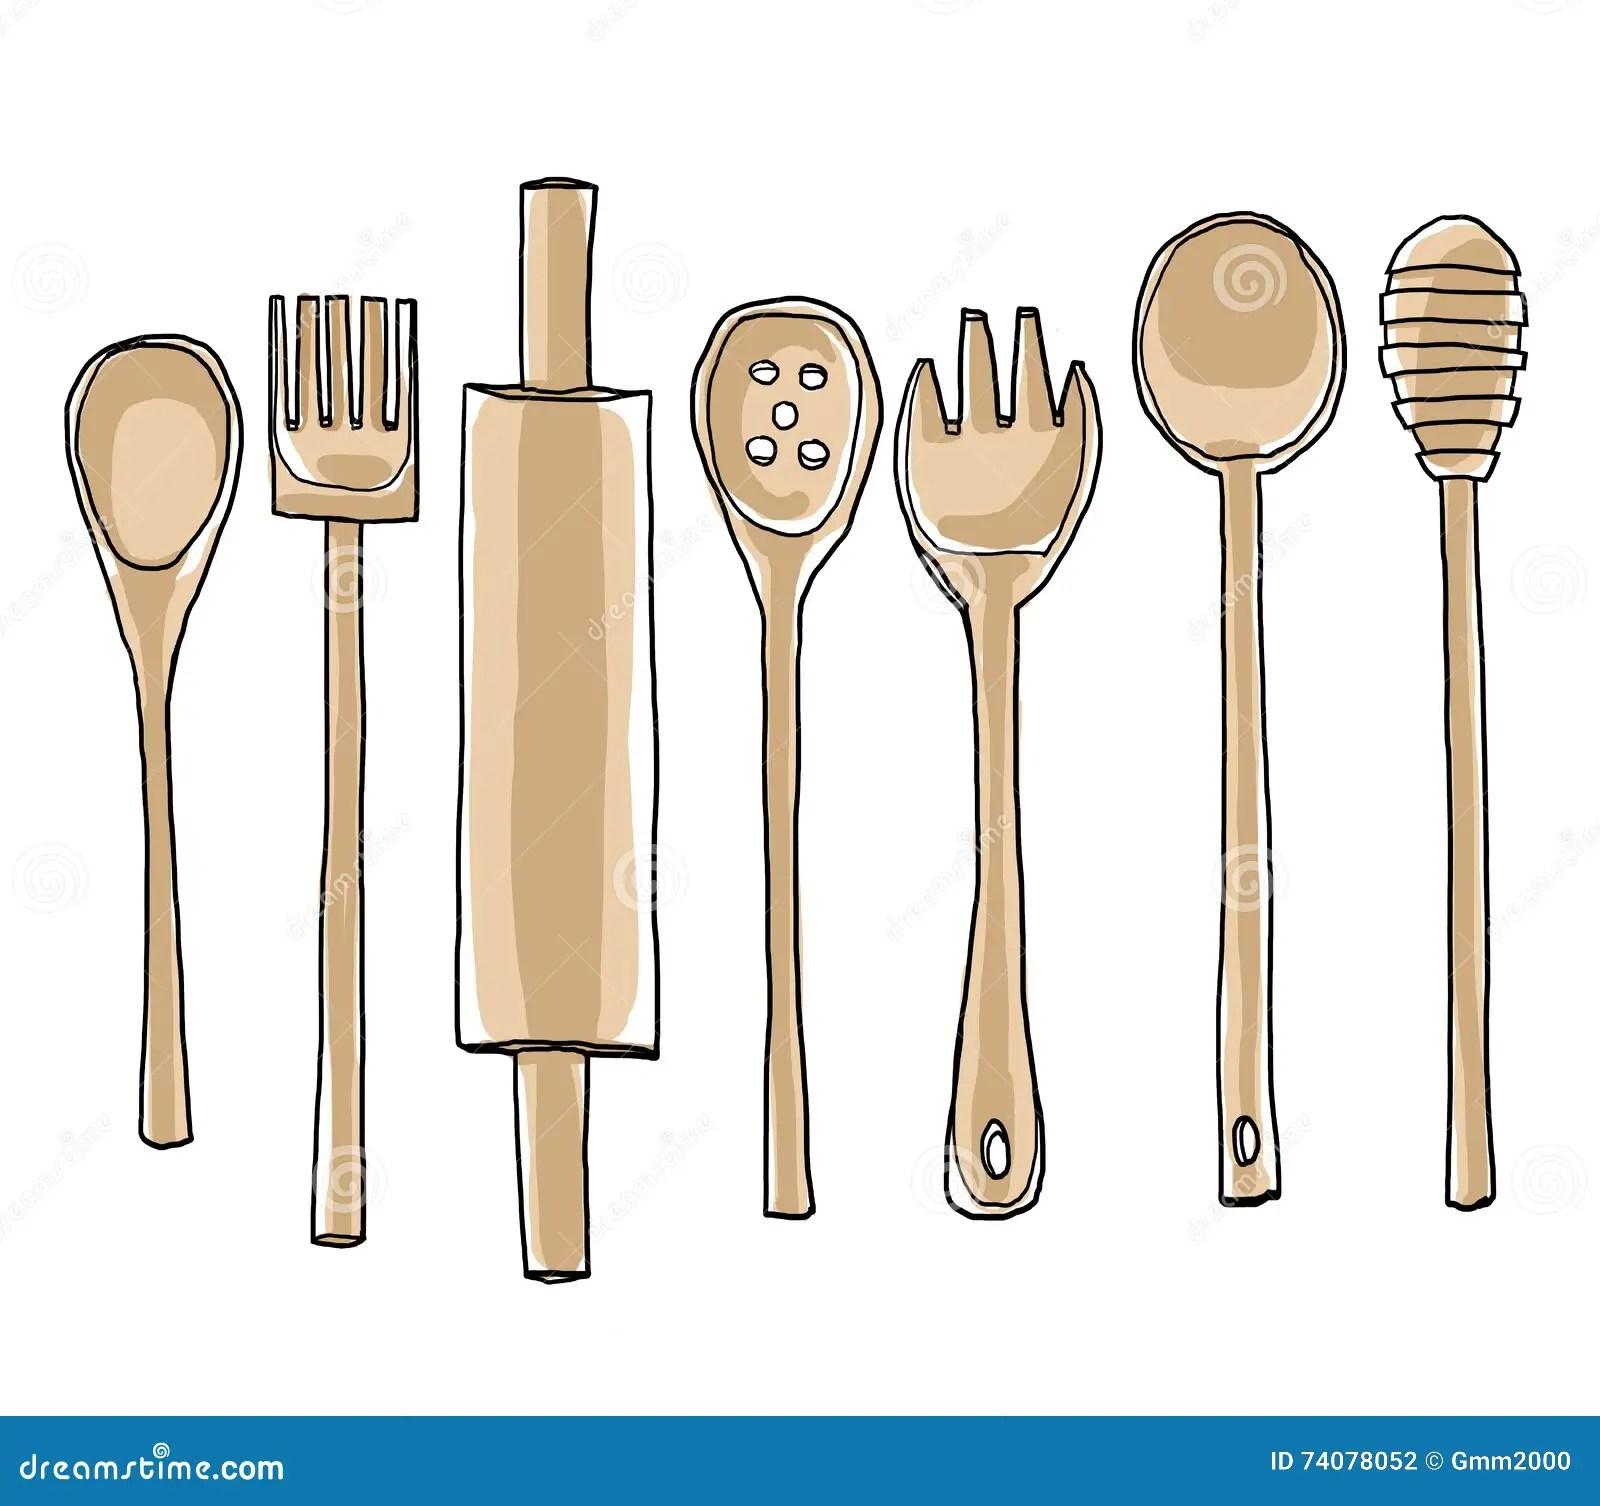 cute kitchen gadgets pantry cabinets freestanding hand drawn utensils cartoon vector cartoondealer